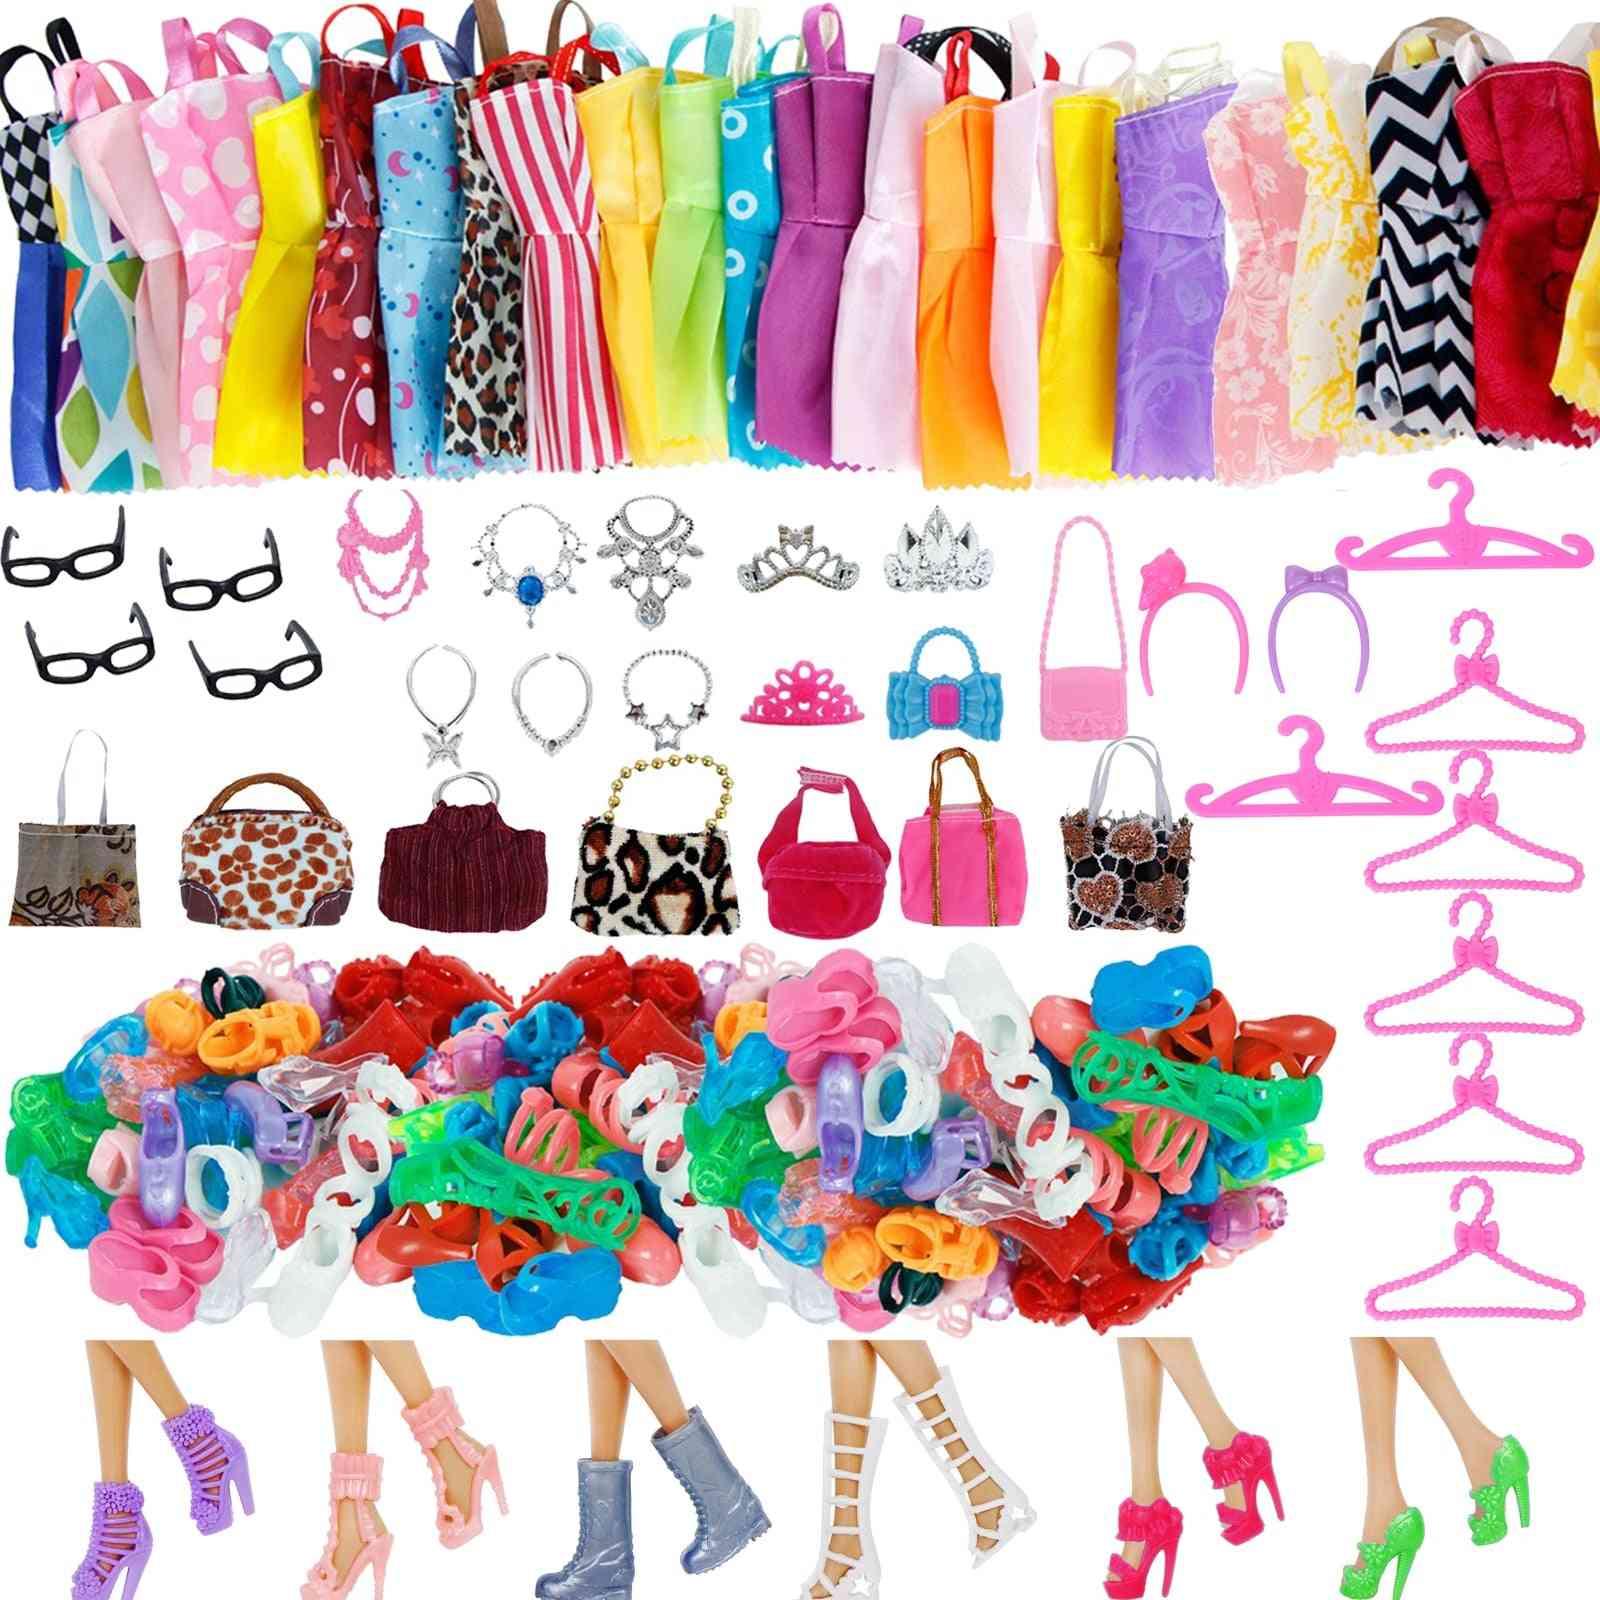 Random 1 Set For Barbie Doll, Boots, Mini Dress, Handbags, Crown Hangers, Glasses - Doll Clothes Kids Toy